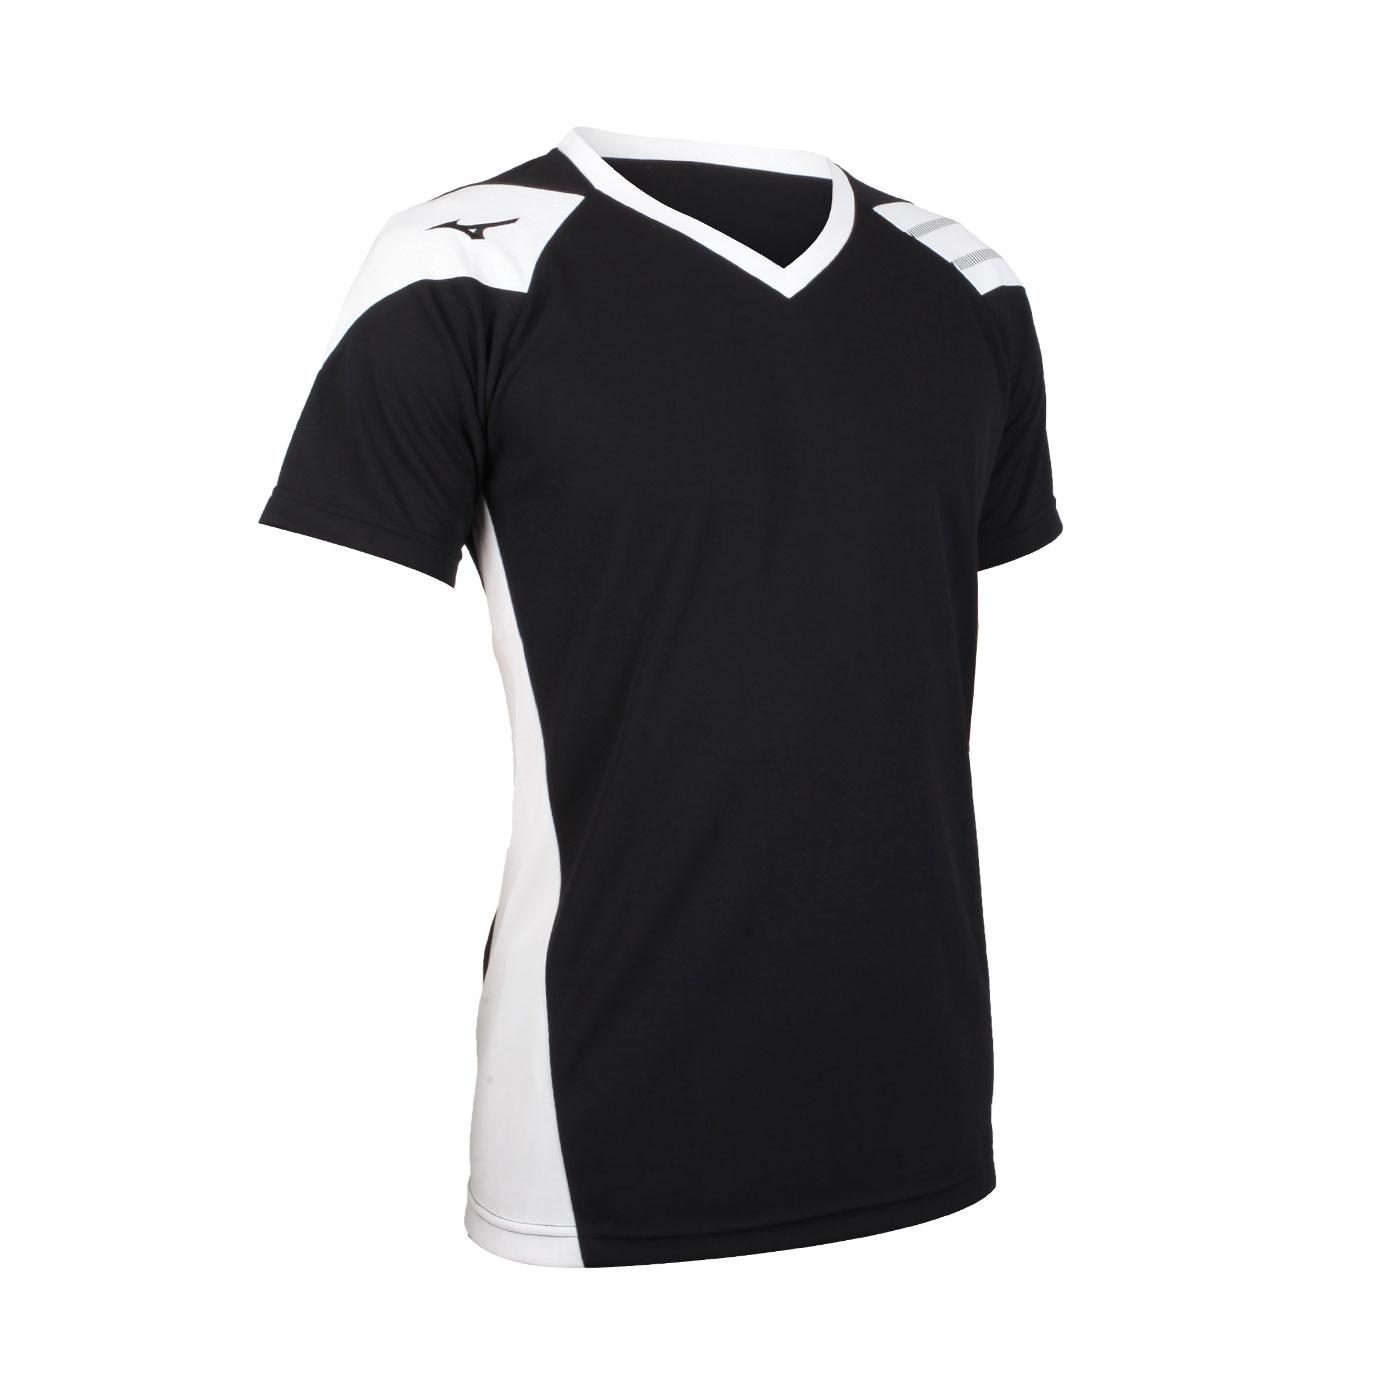 MIZUNO 排球短袖T恤 V2TA0G1601 - 黑白